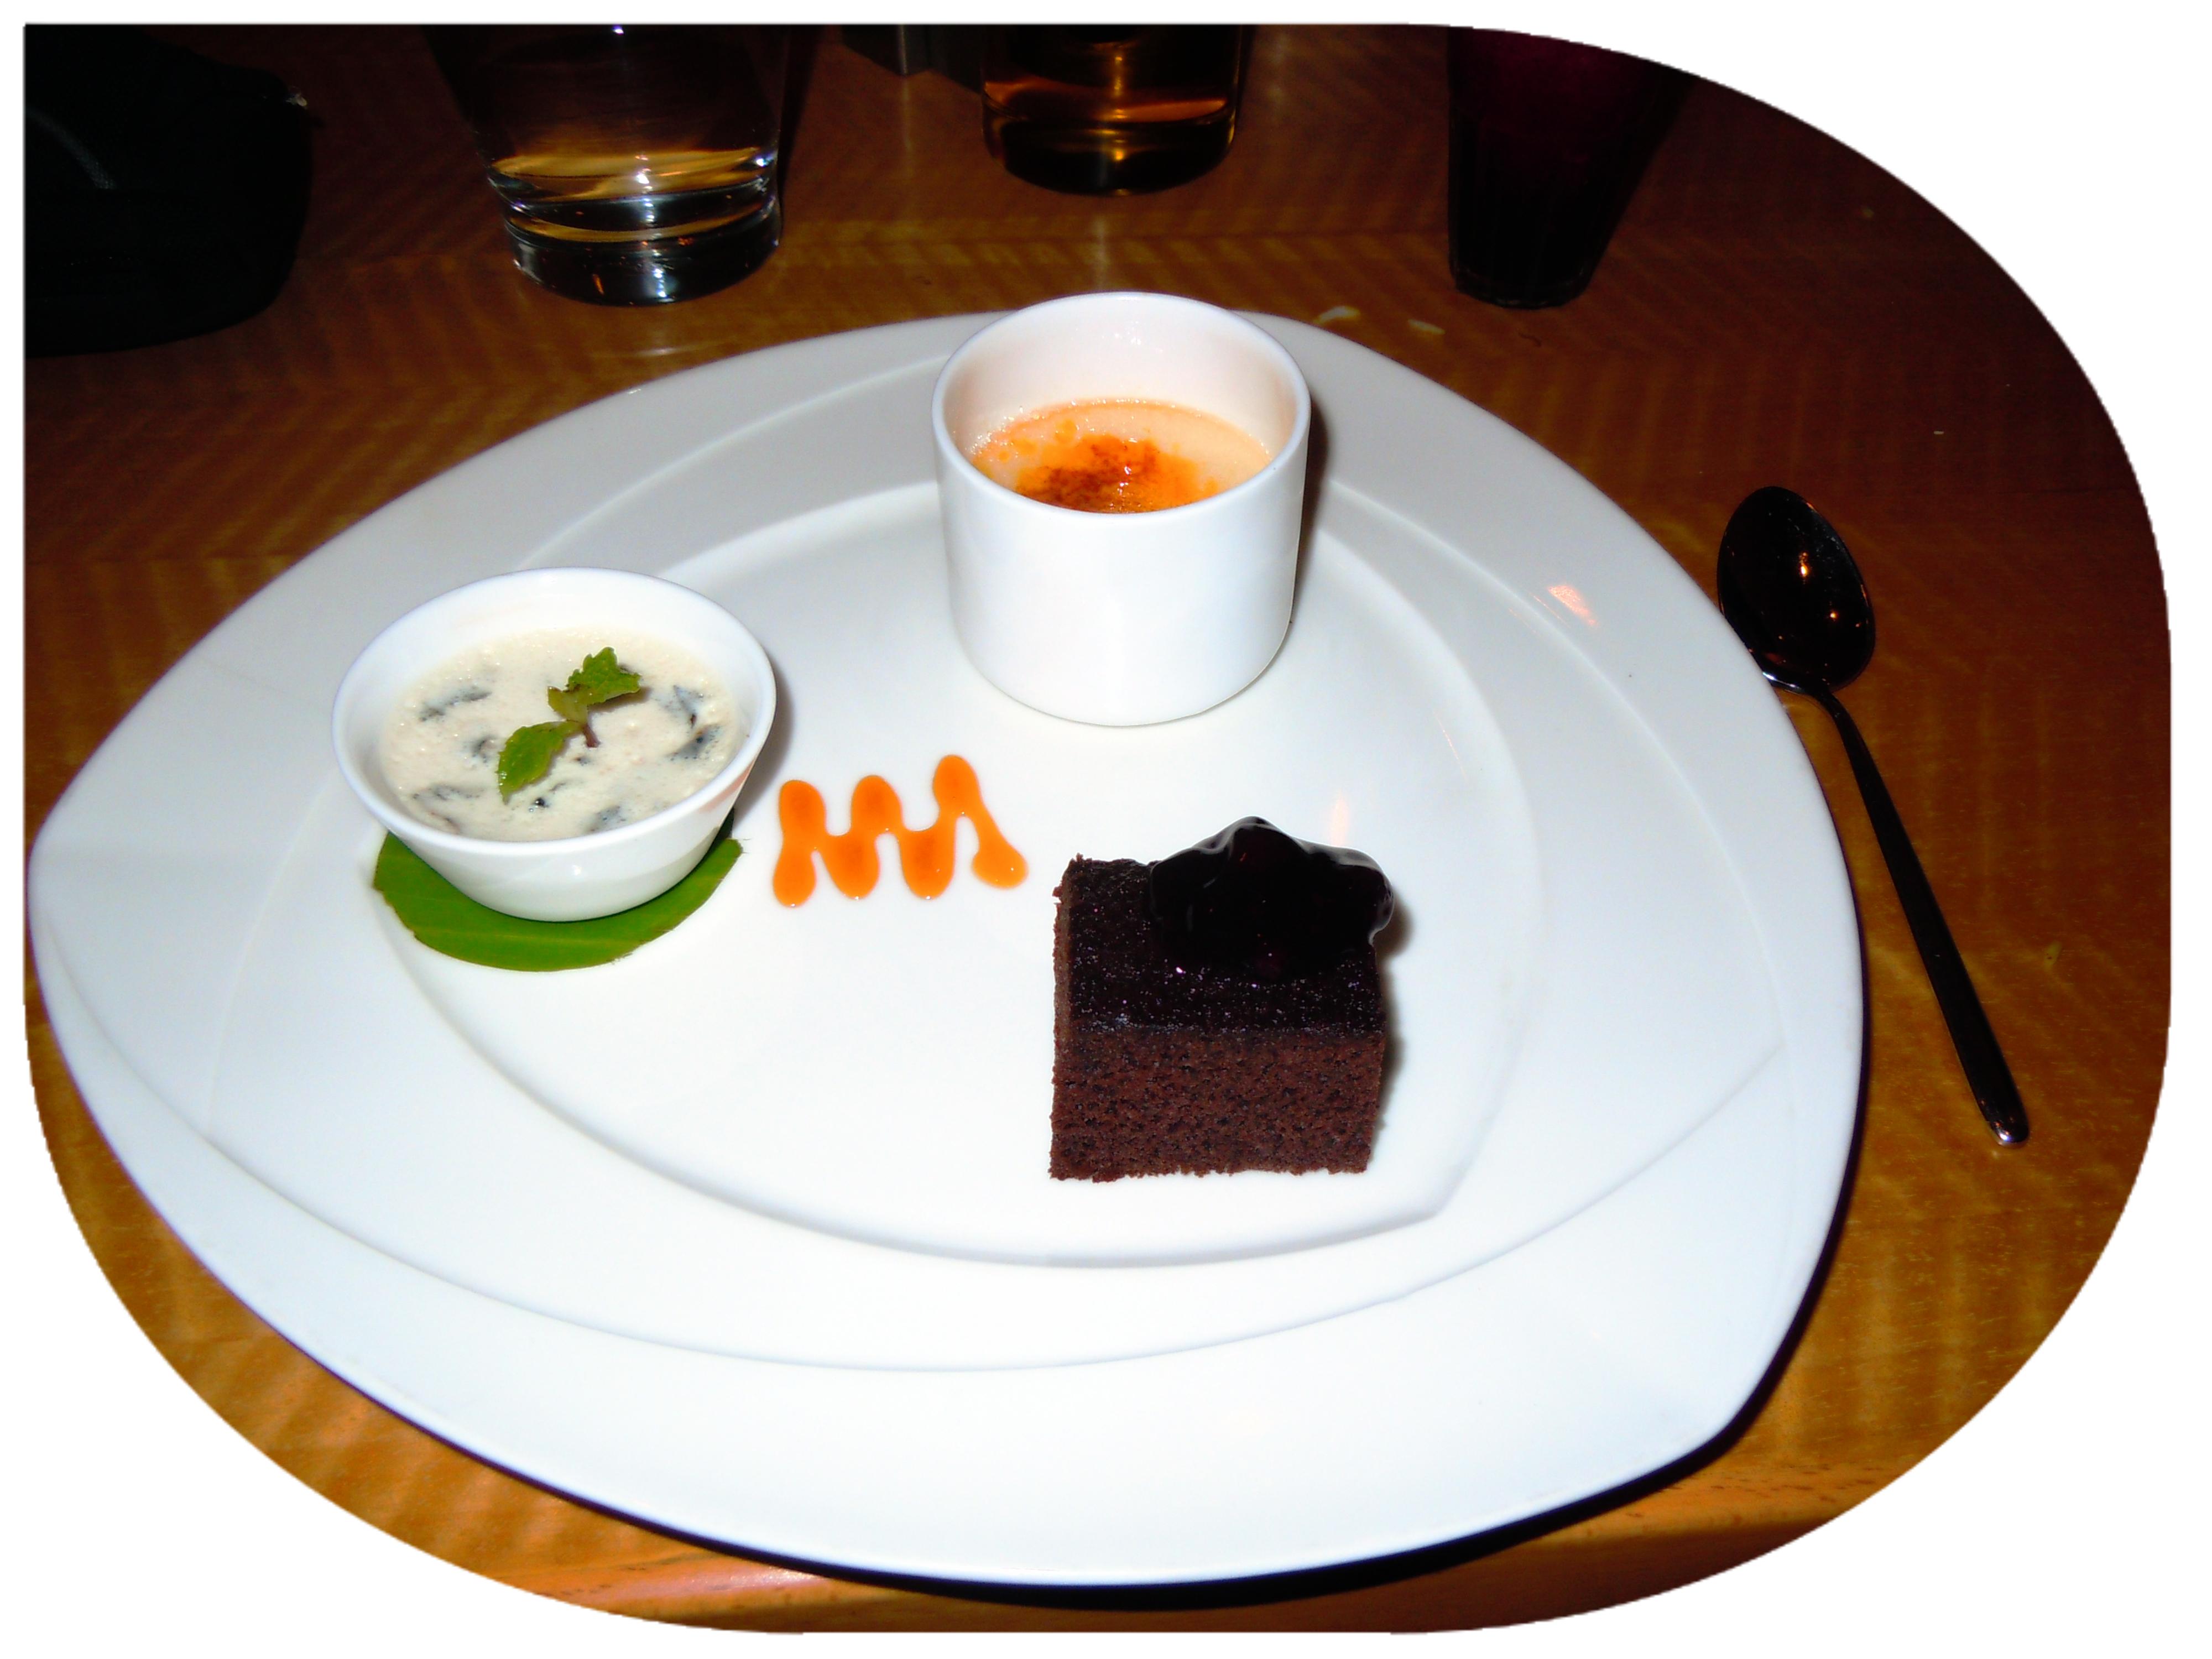 Desserts: Crème brûlée, chocolate cake, and baked yoghurt